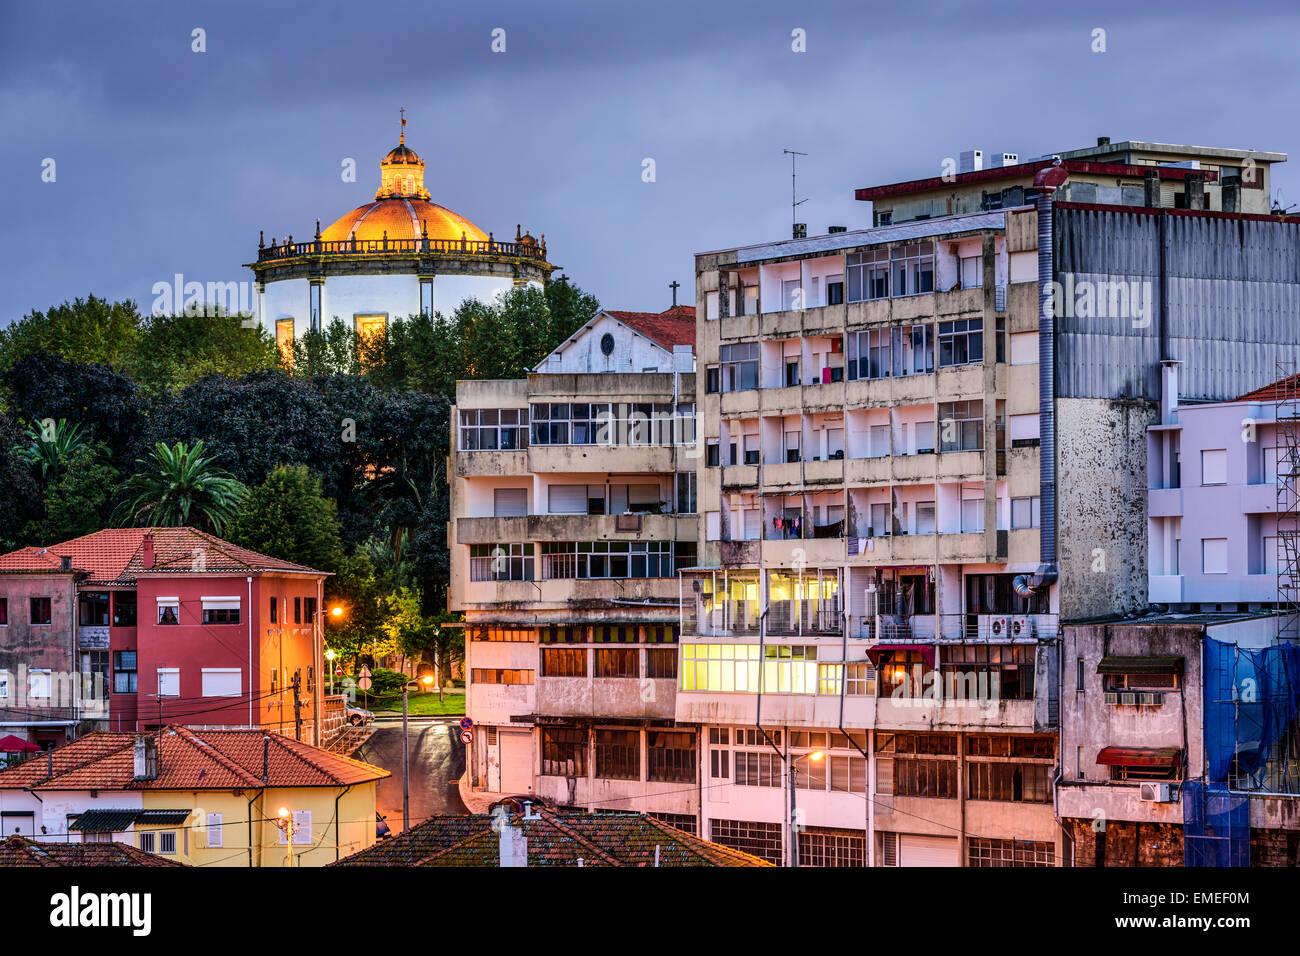 Vila Nova de Gaia, Portugal at Serra de Pilar Monastery. - Stock Image